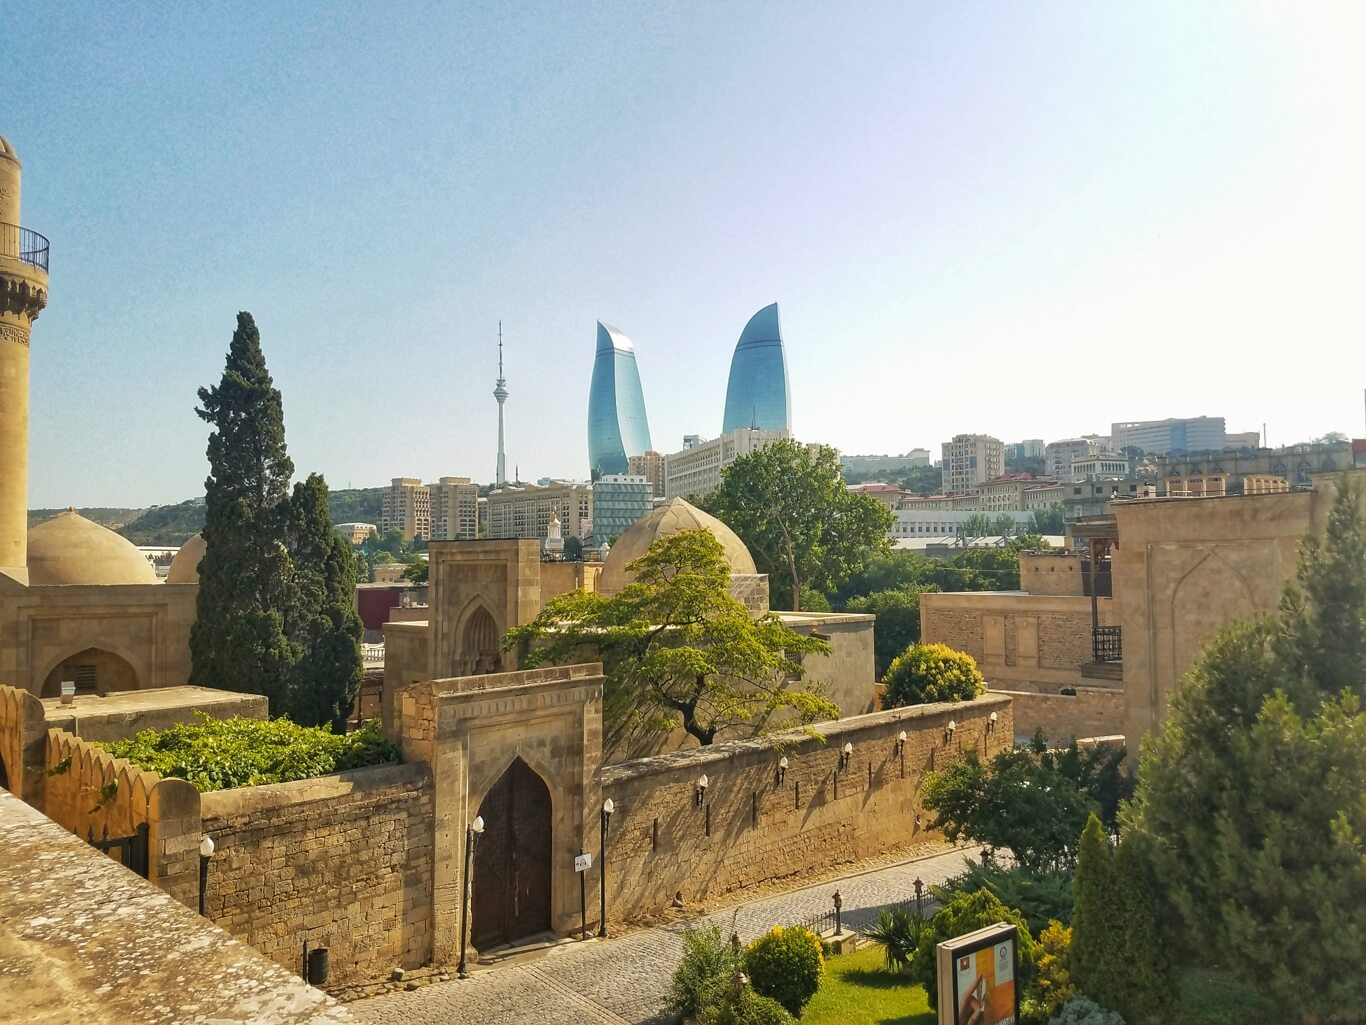 skyscrapers in Azerbaijan